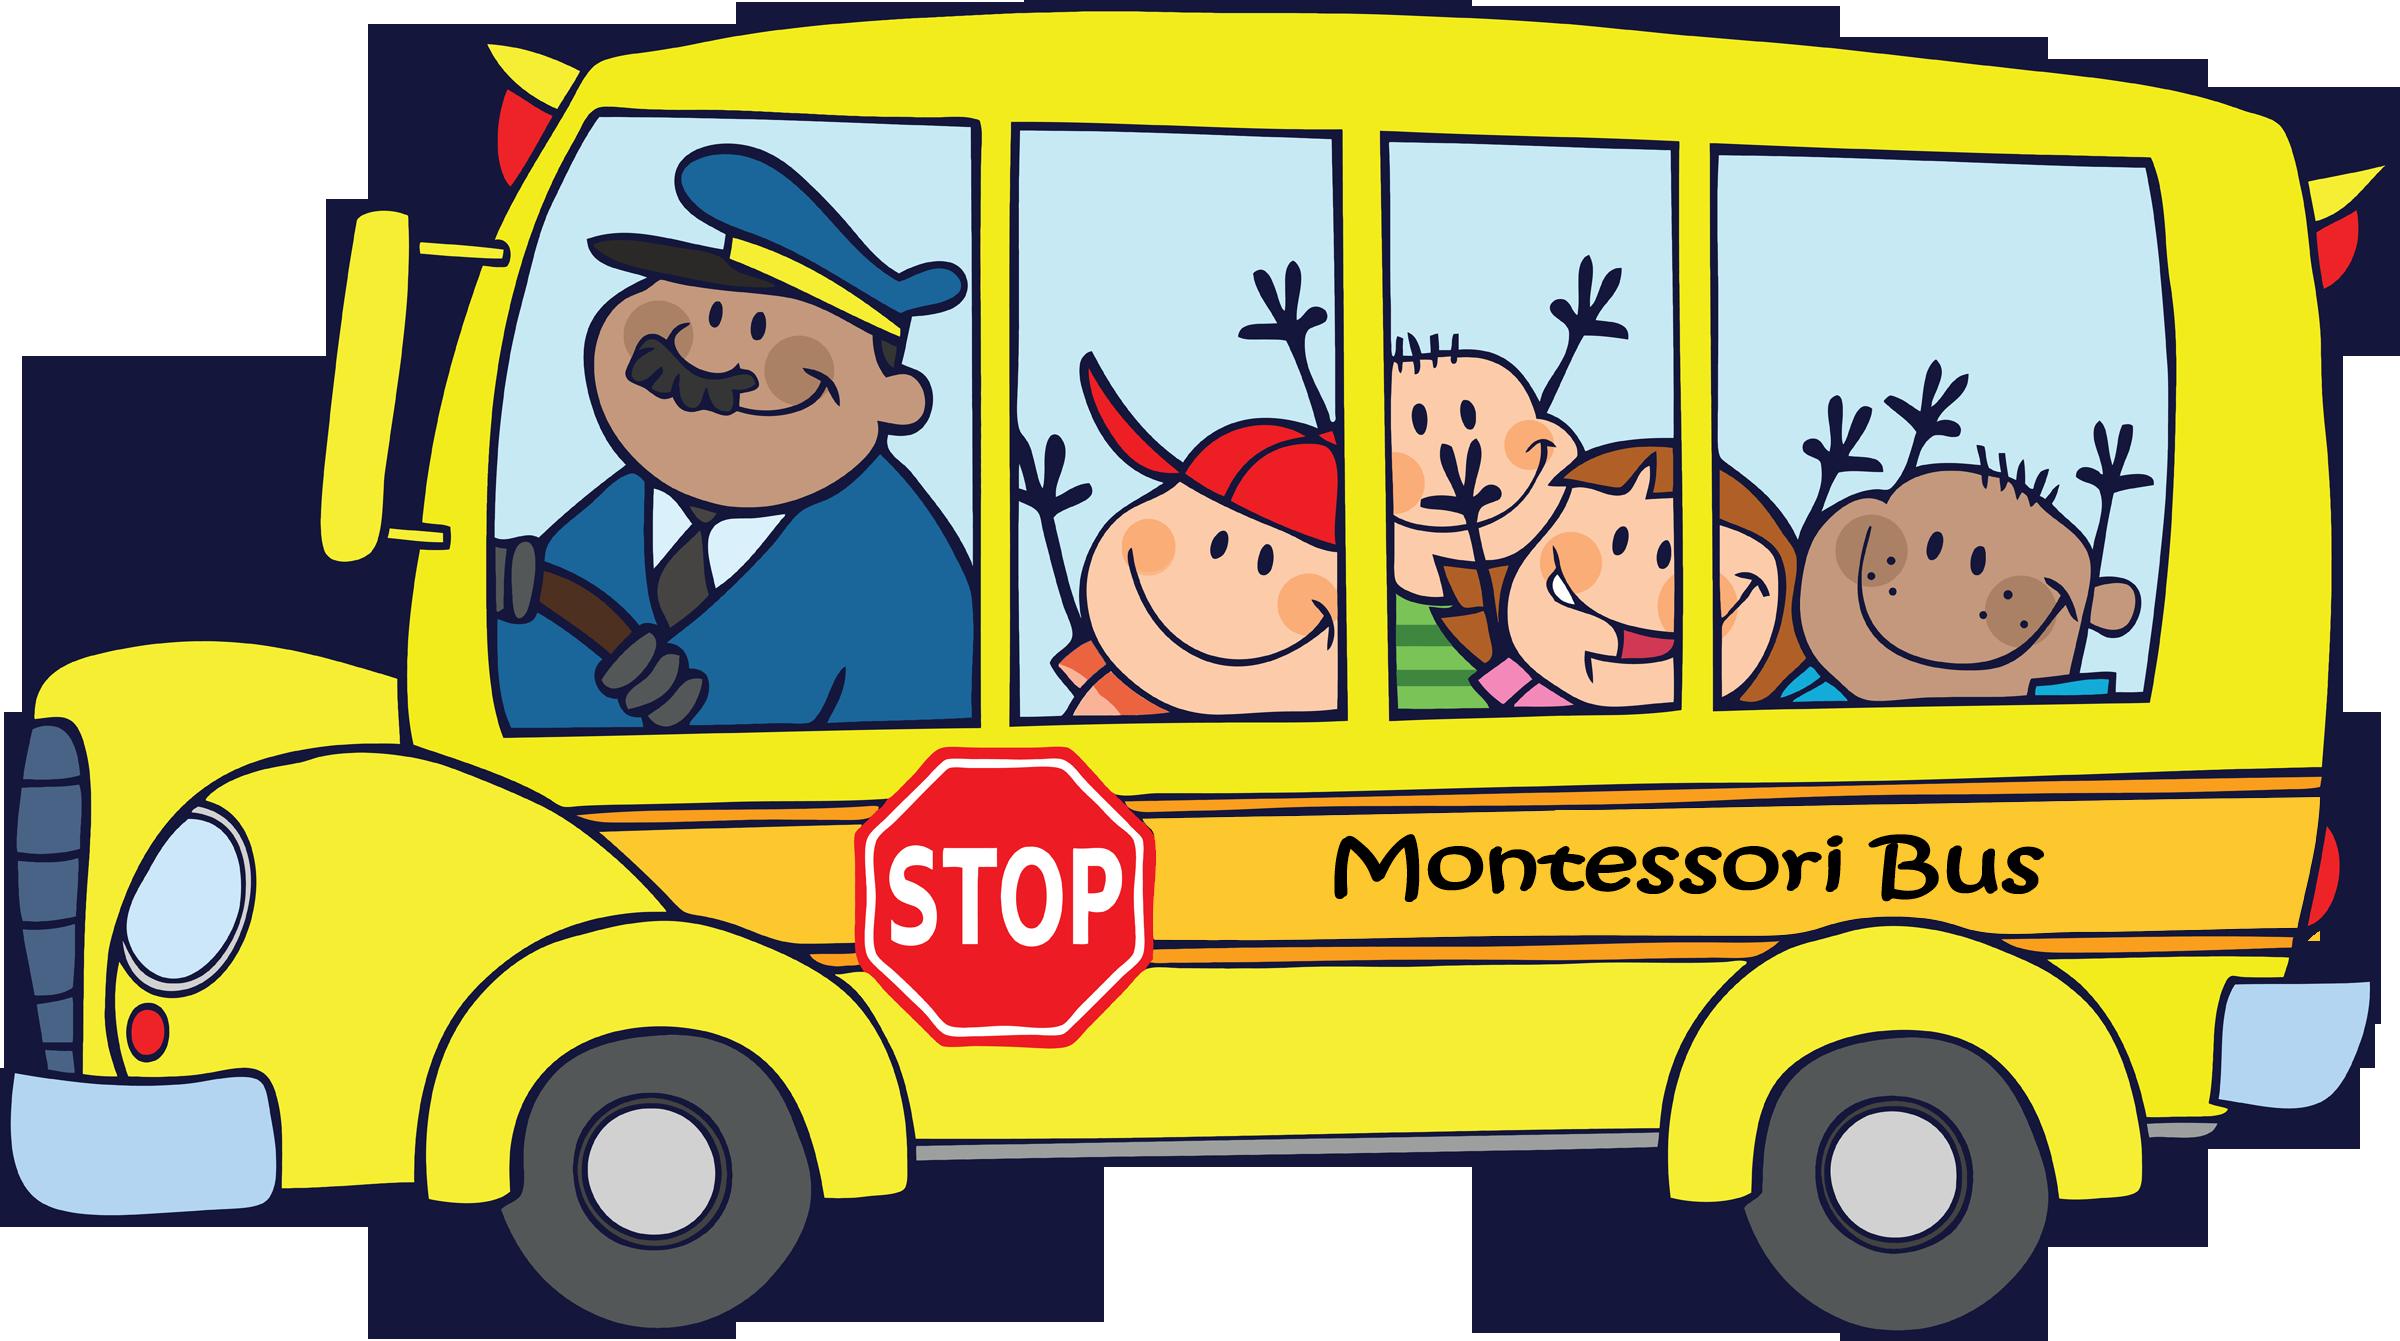 Montessori Bus